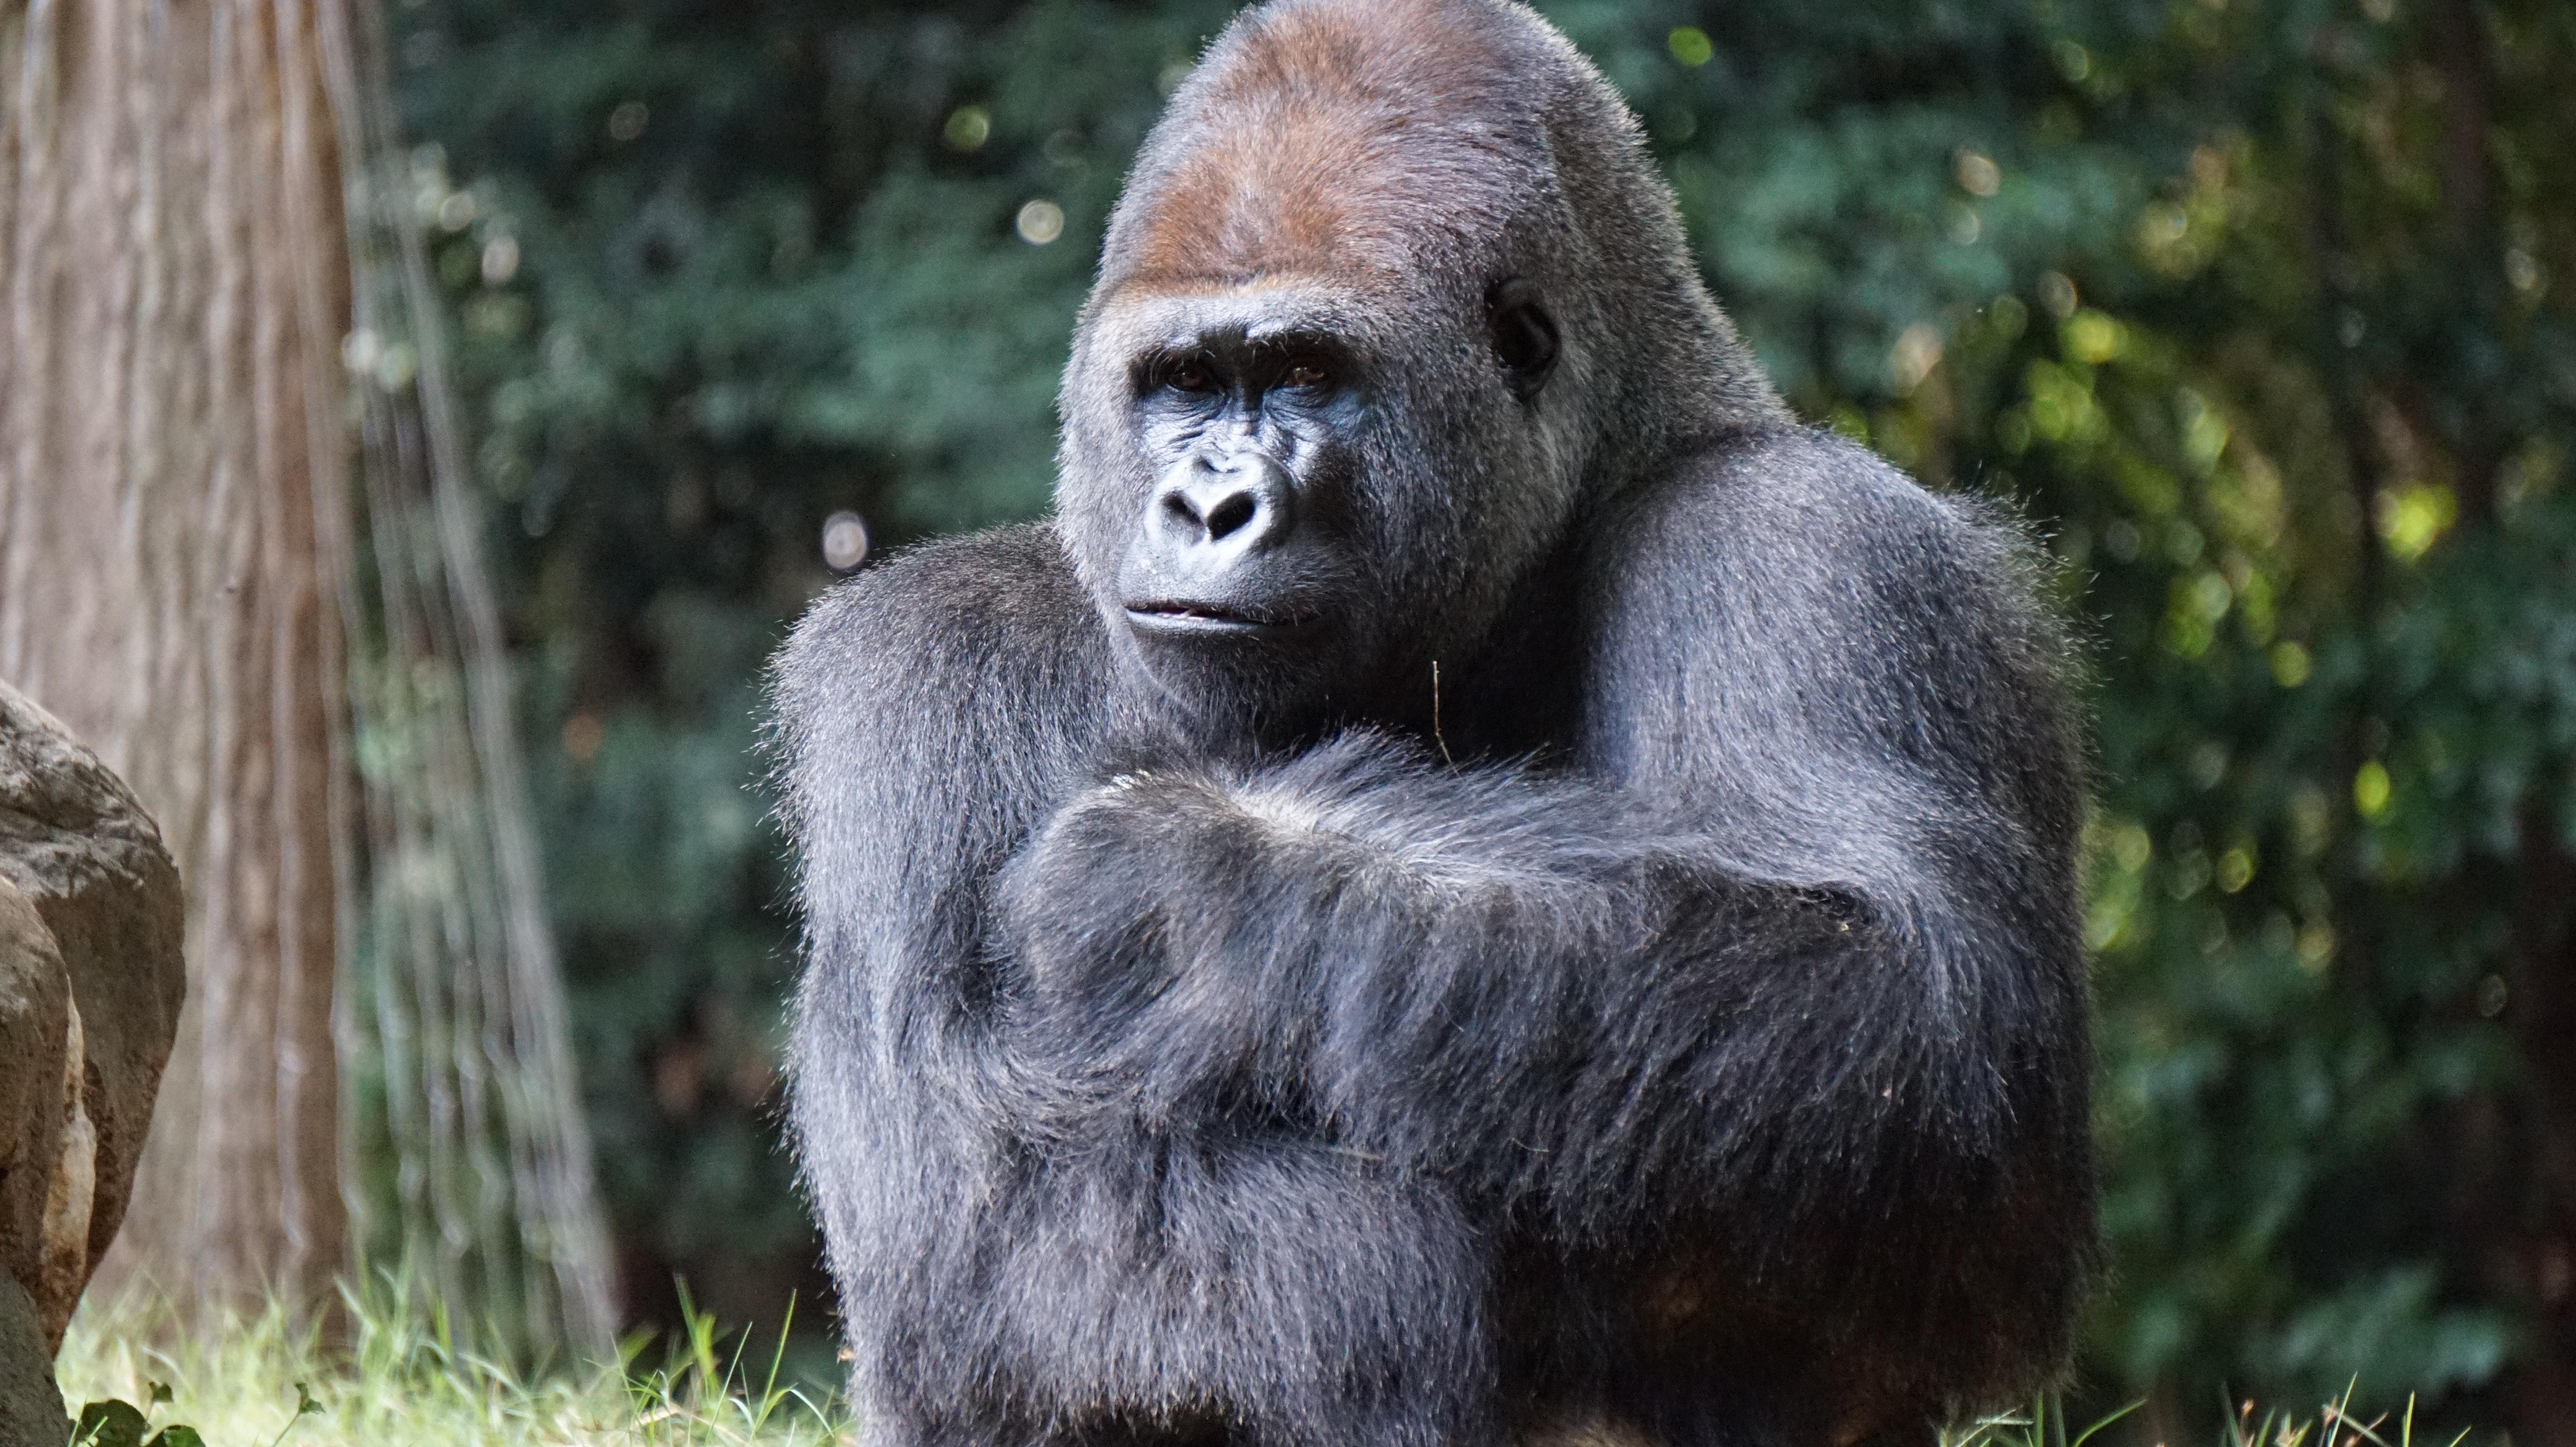 Gorilla beside brown rock photo